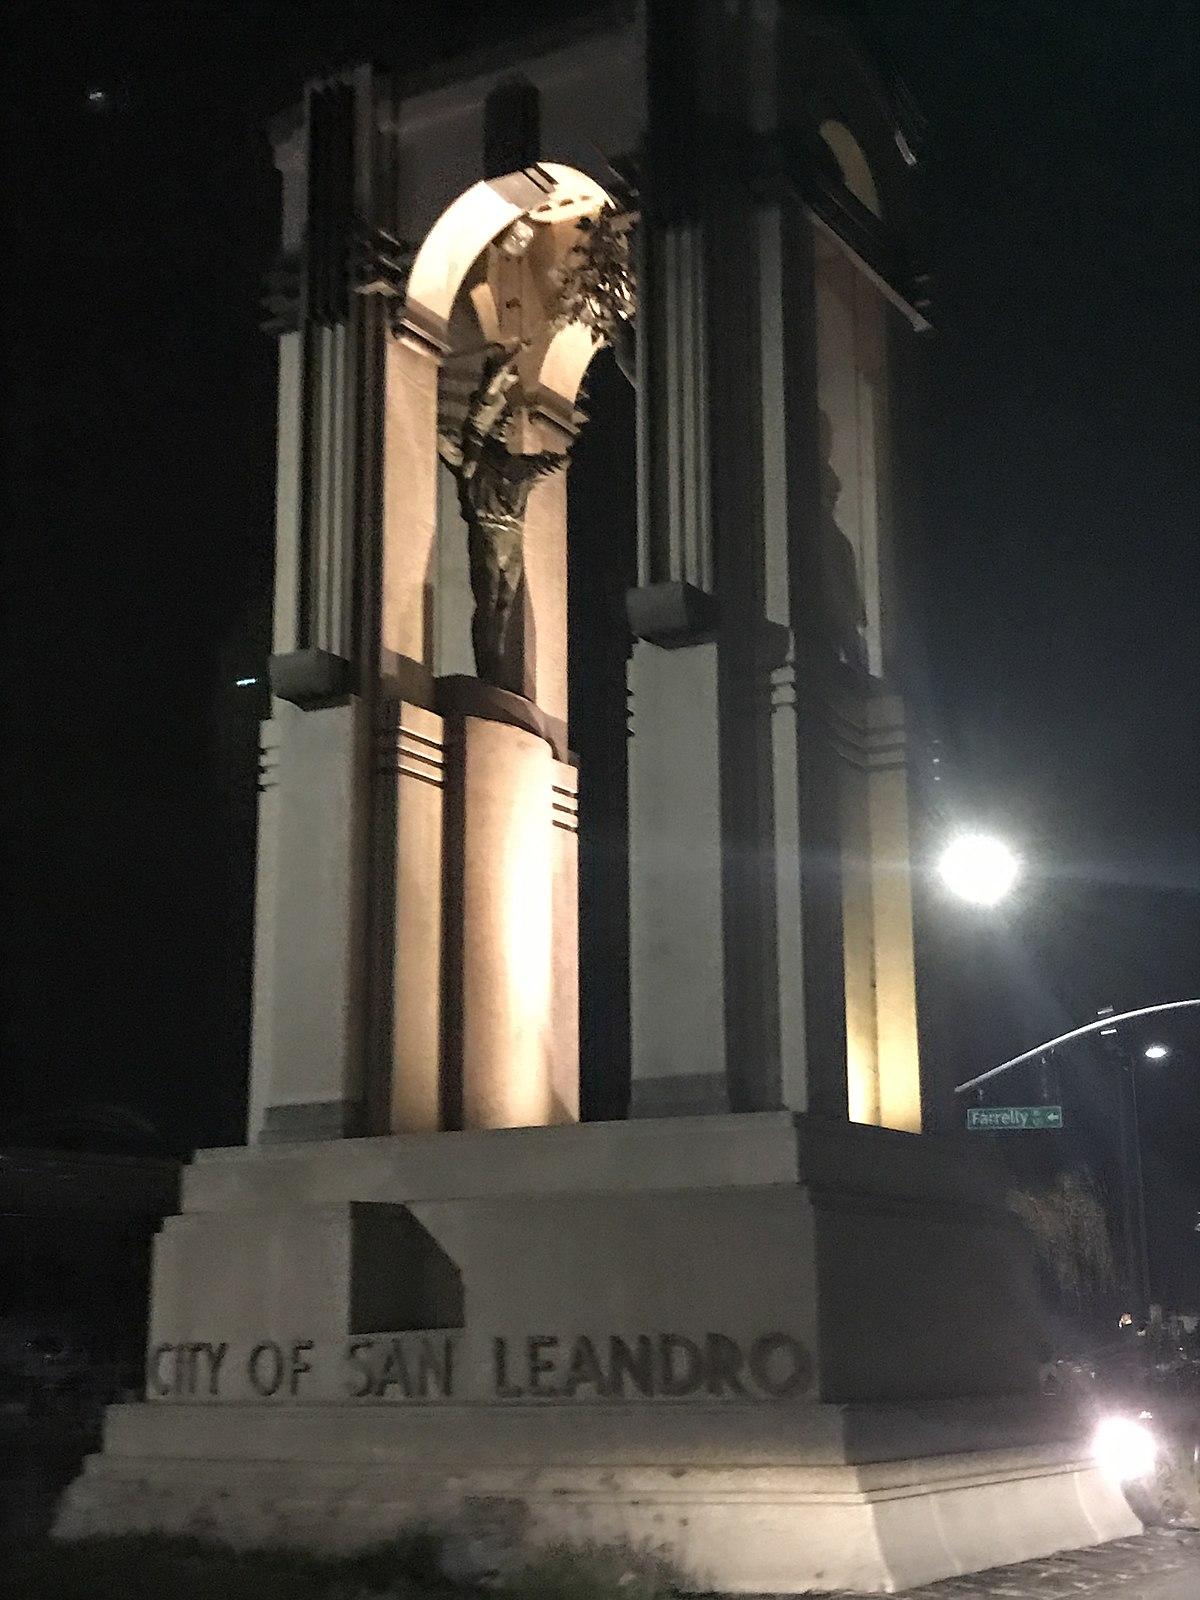 City of San Leandro.jpg